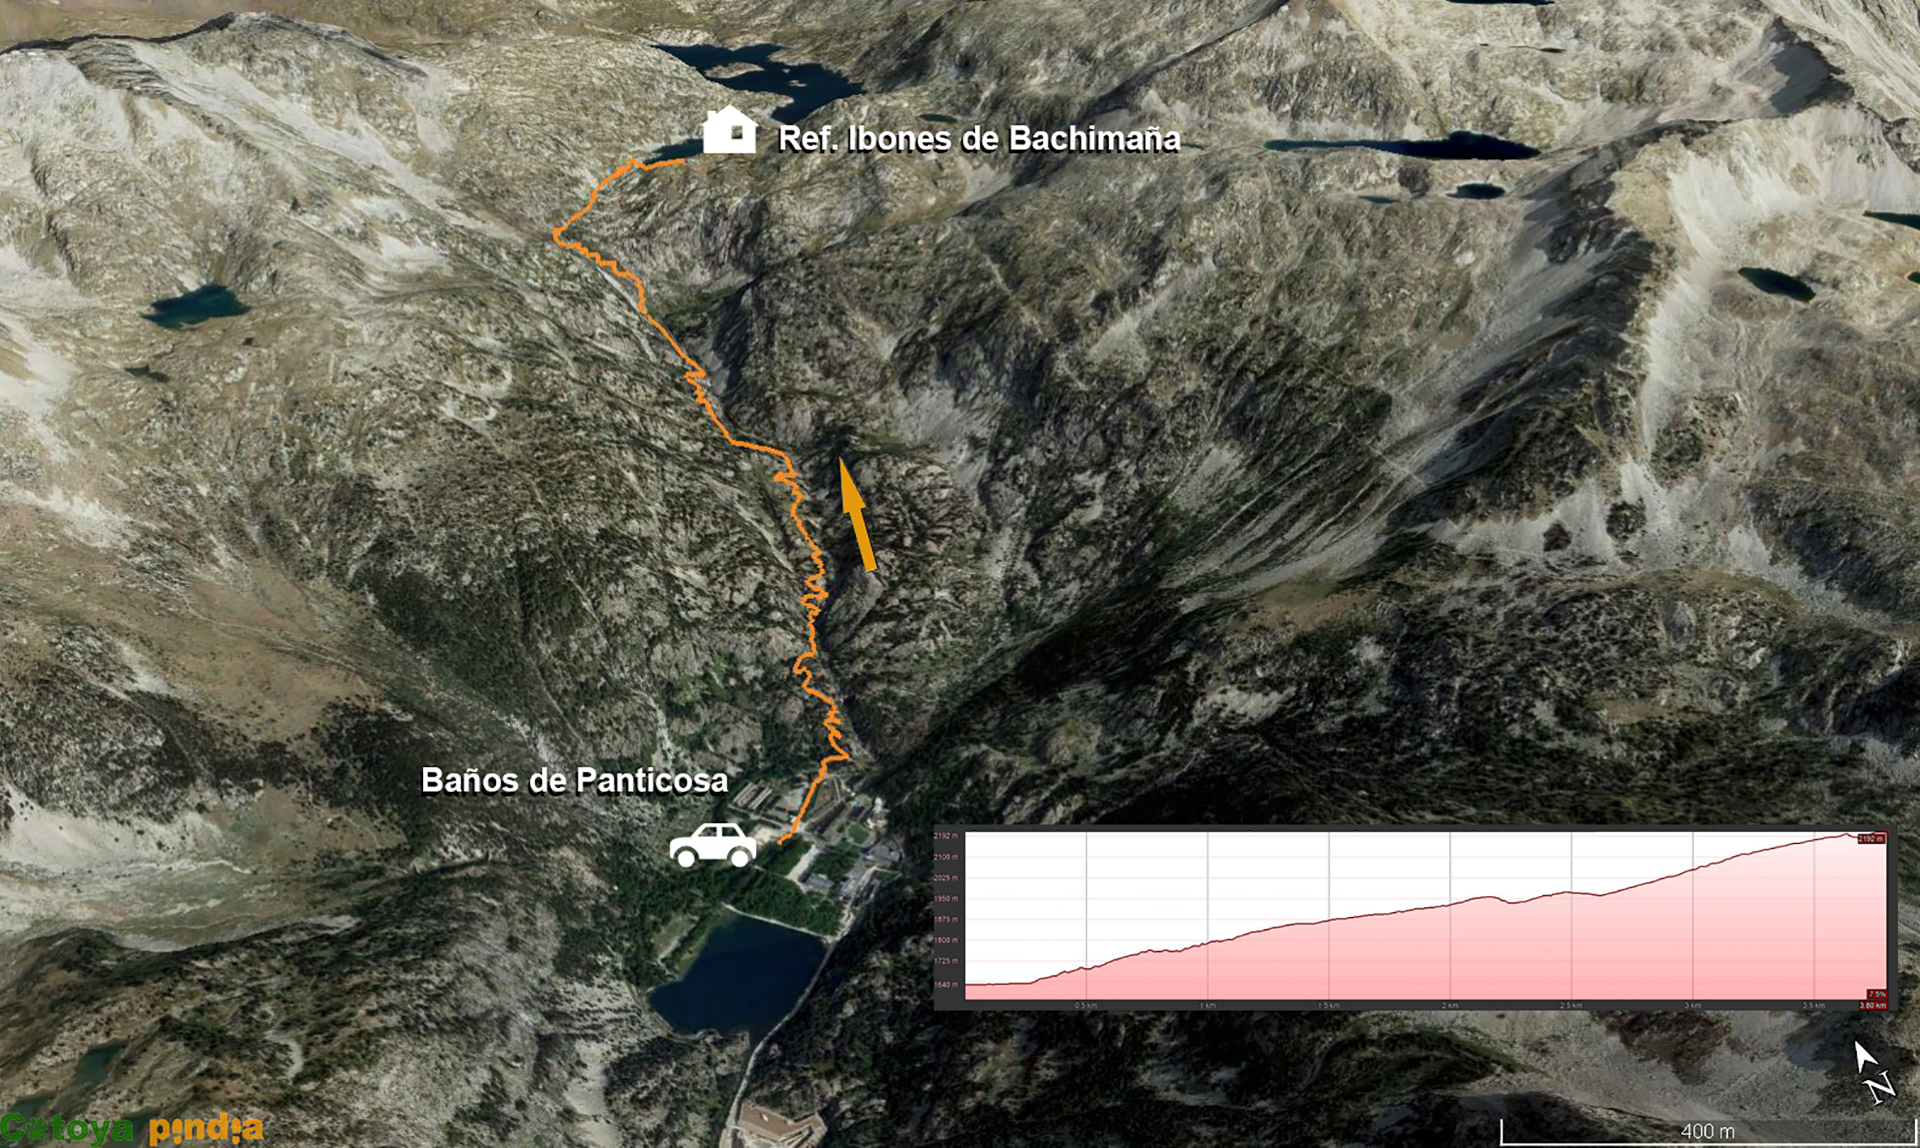 Mapa señalizado de la ruta de Panticosa al Refugio de Bachimaña